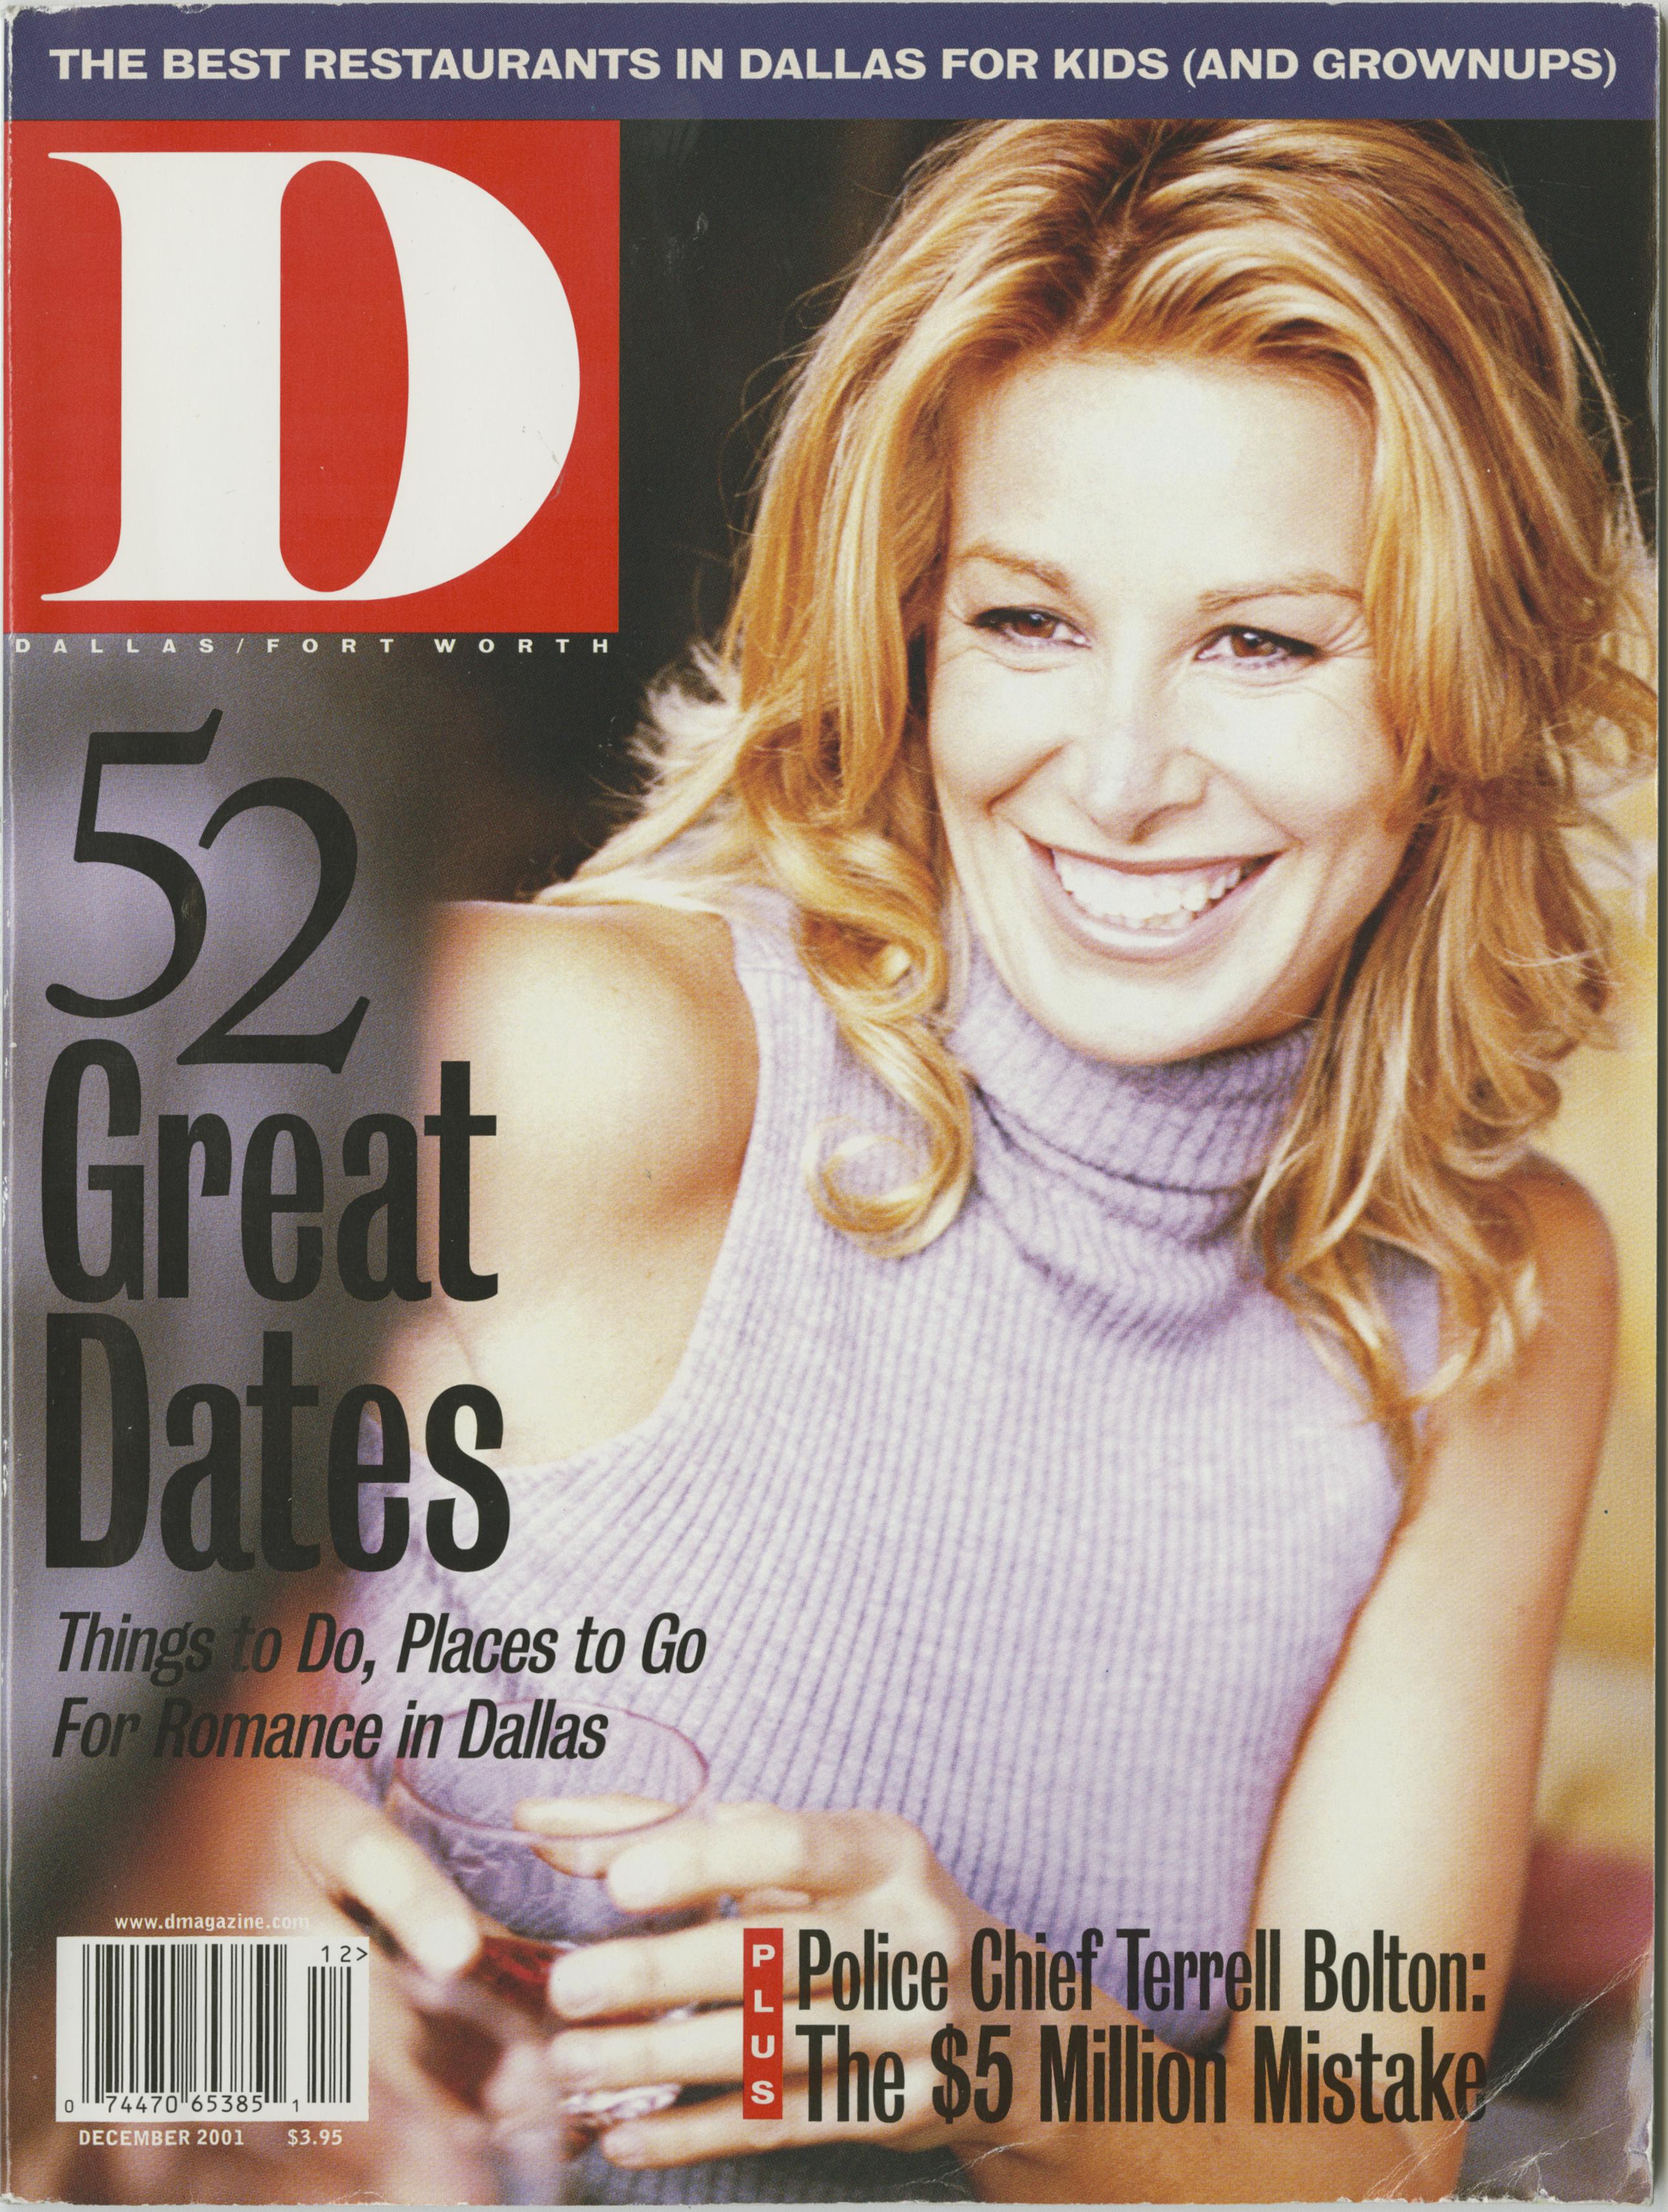 December 2001 cover